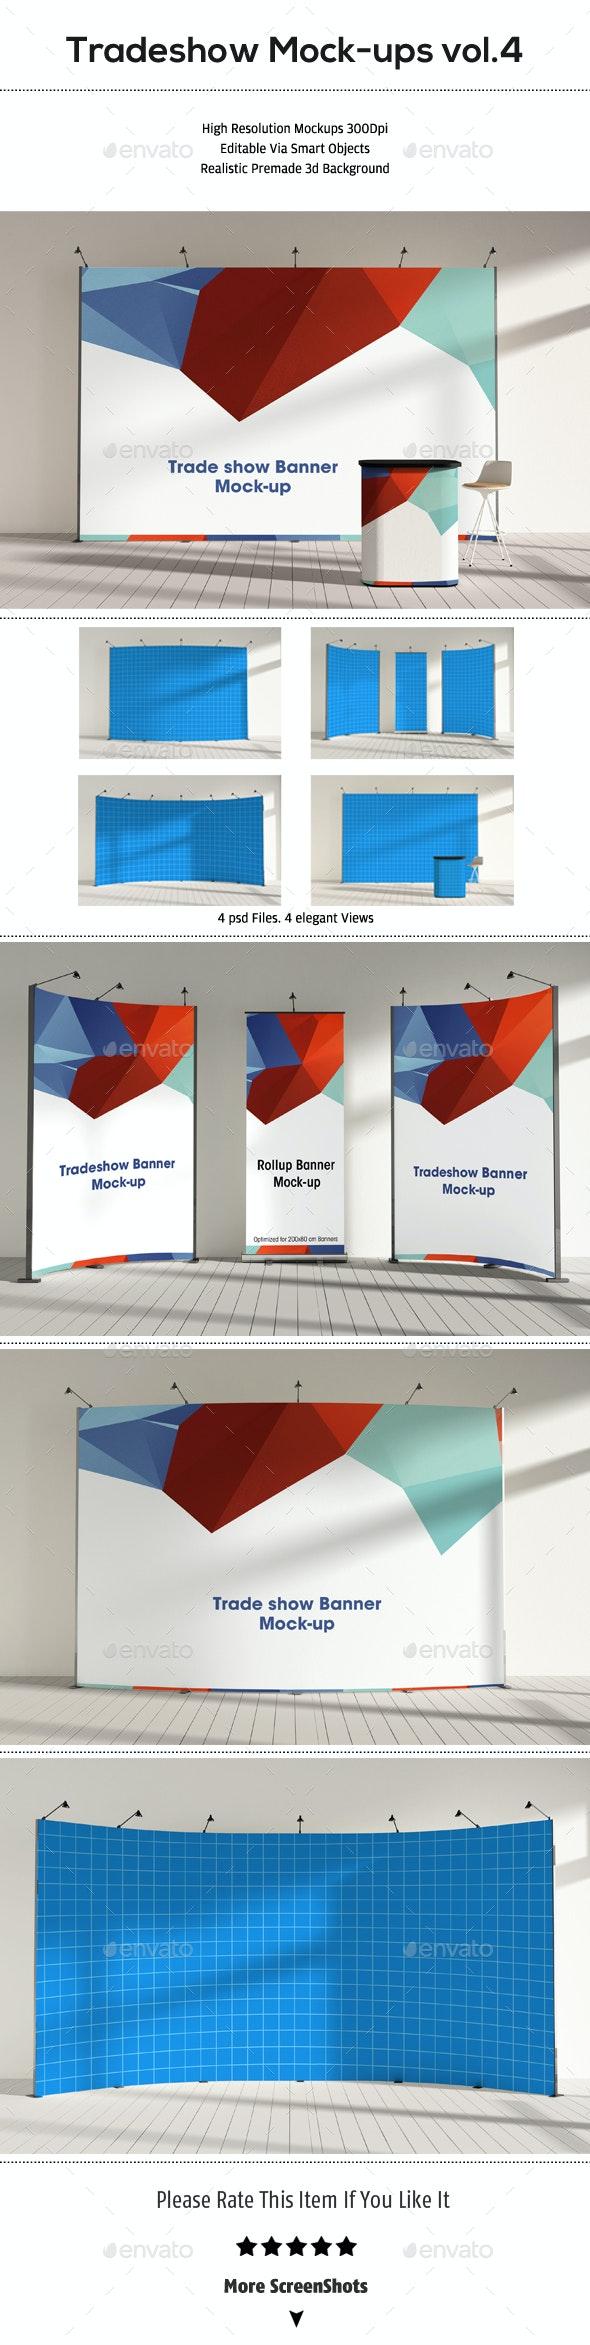 Trade Show Booth Mock-ups Vol.4 - Product Mock-Ups Graphics